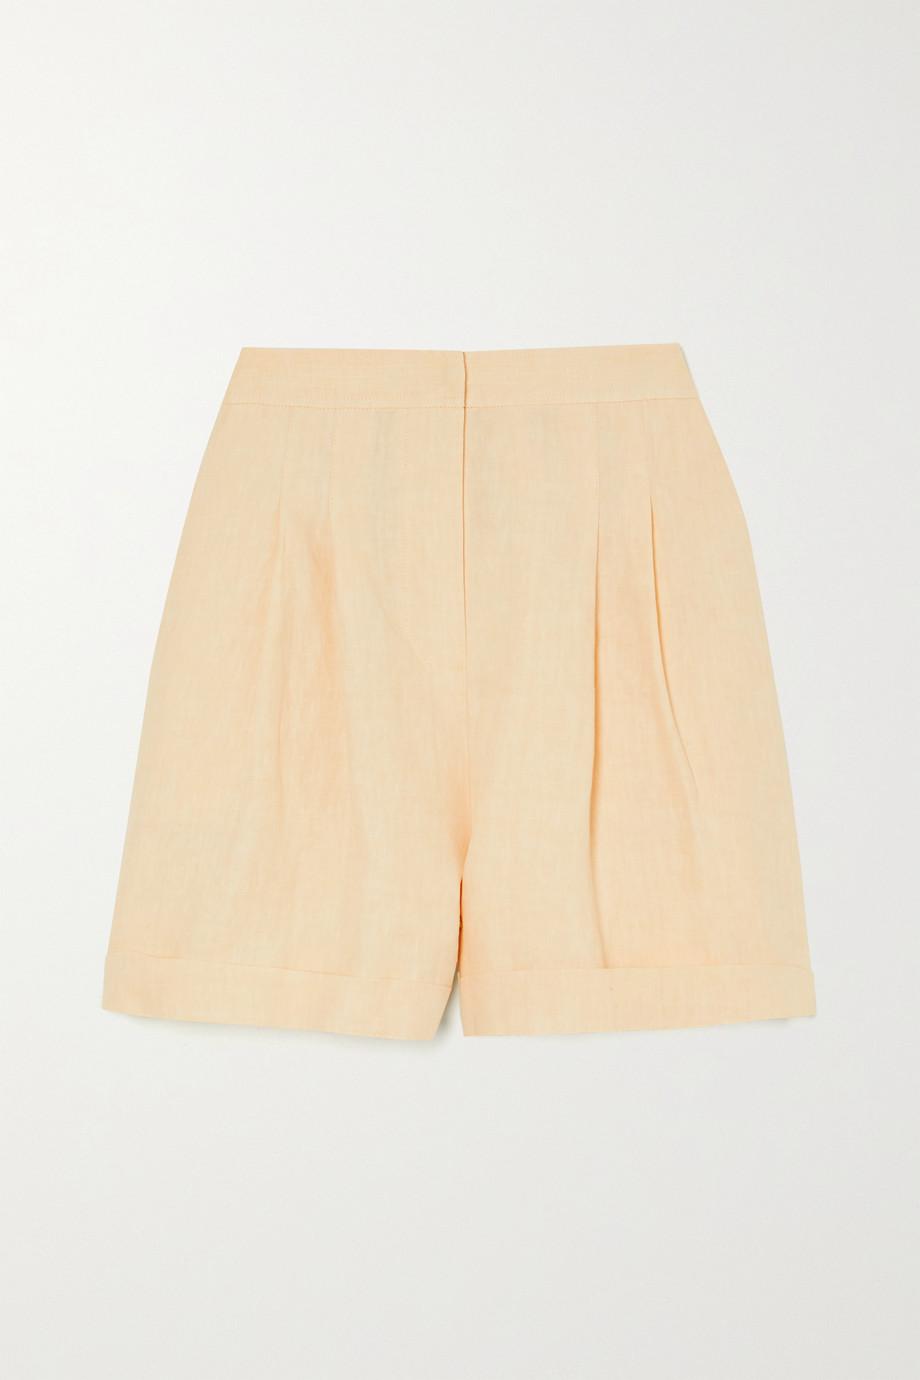 Le Kasha 【NET SUSTAIN】Le Kasha x LG Electronics 褶裥亚麻短裤